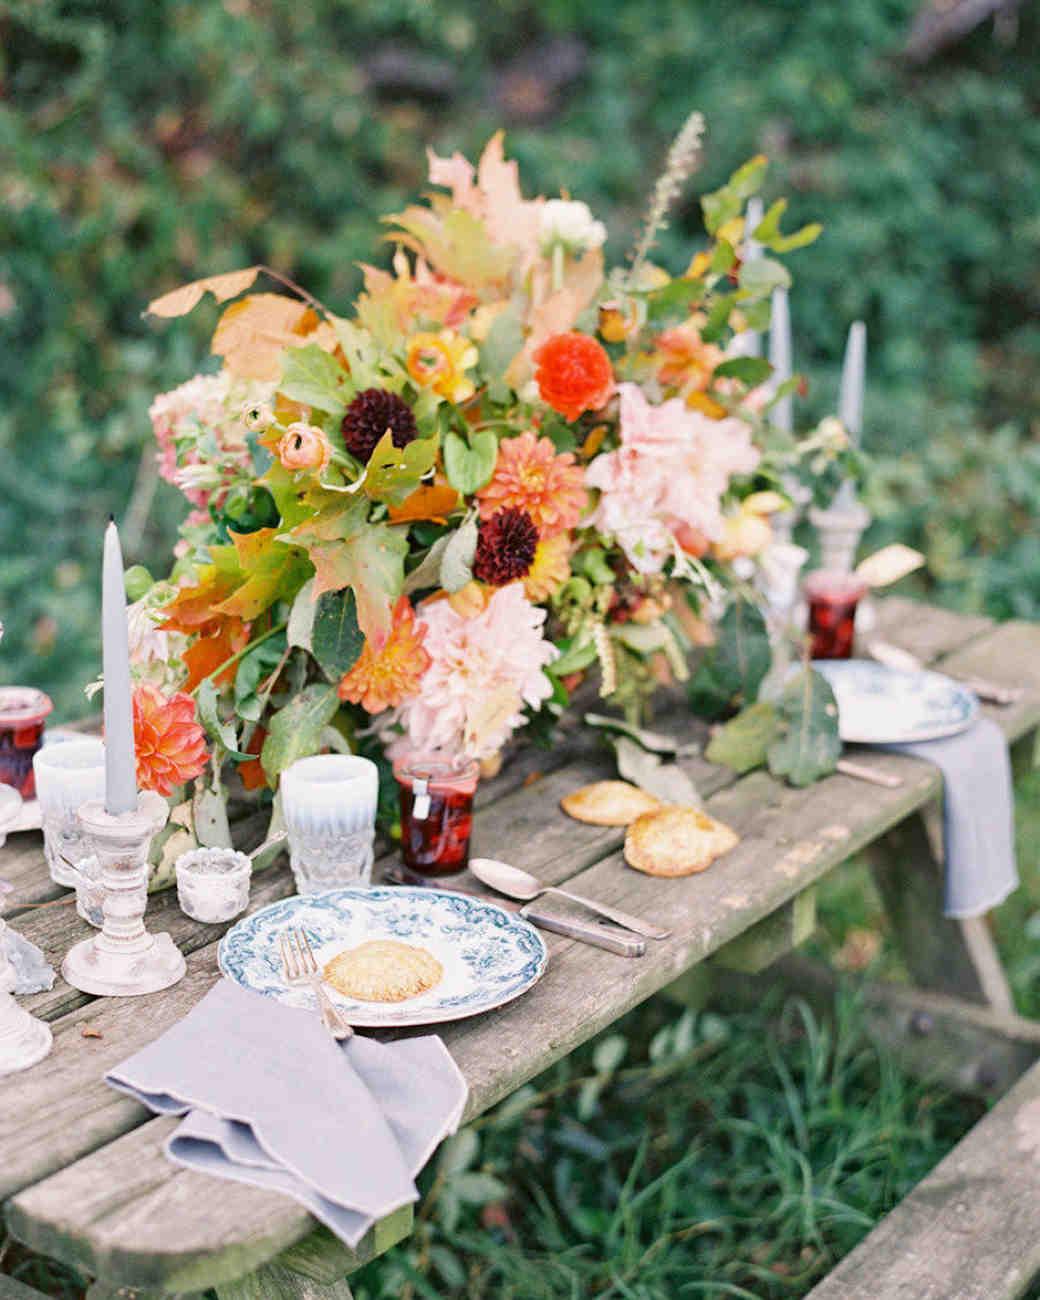 28 of the prettiest rustic wedding centerpieces martha stewart rh marthastewartweddings com centerpieces for october wedding centerpieces for autumn wedding